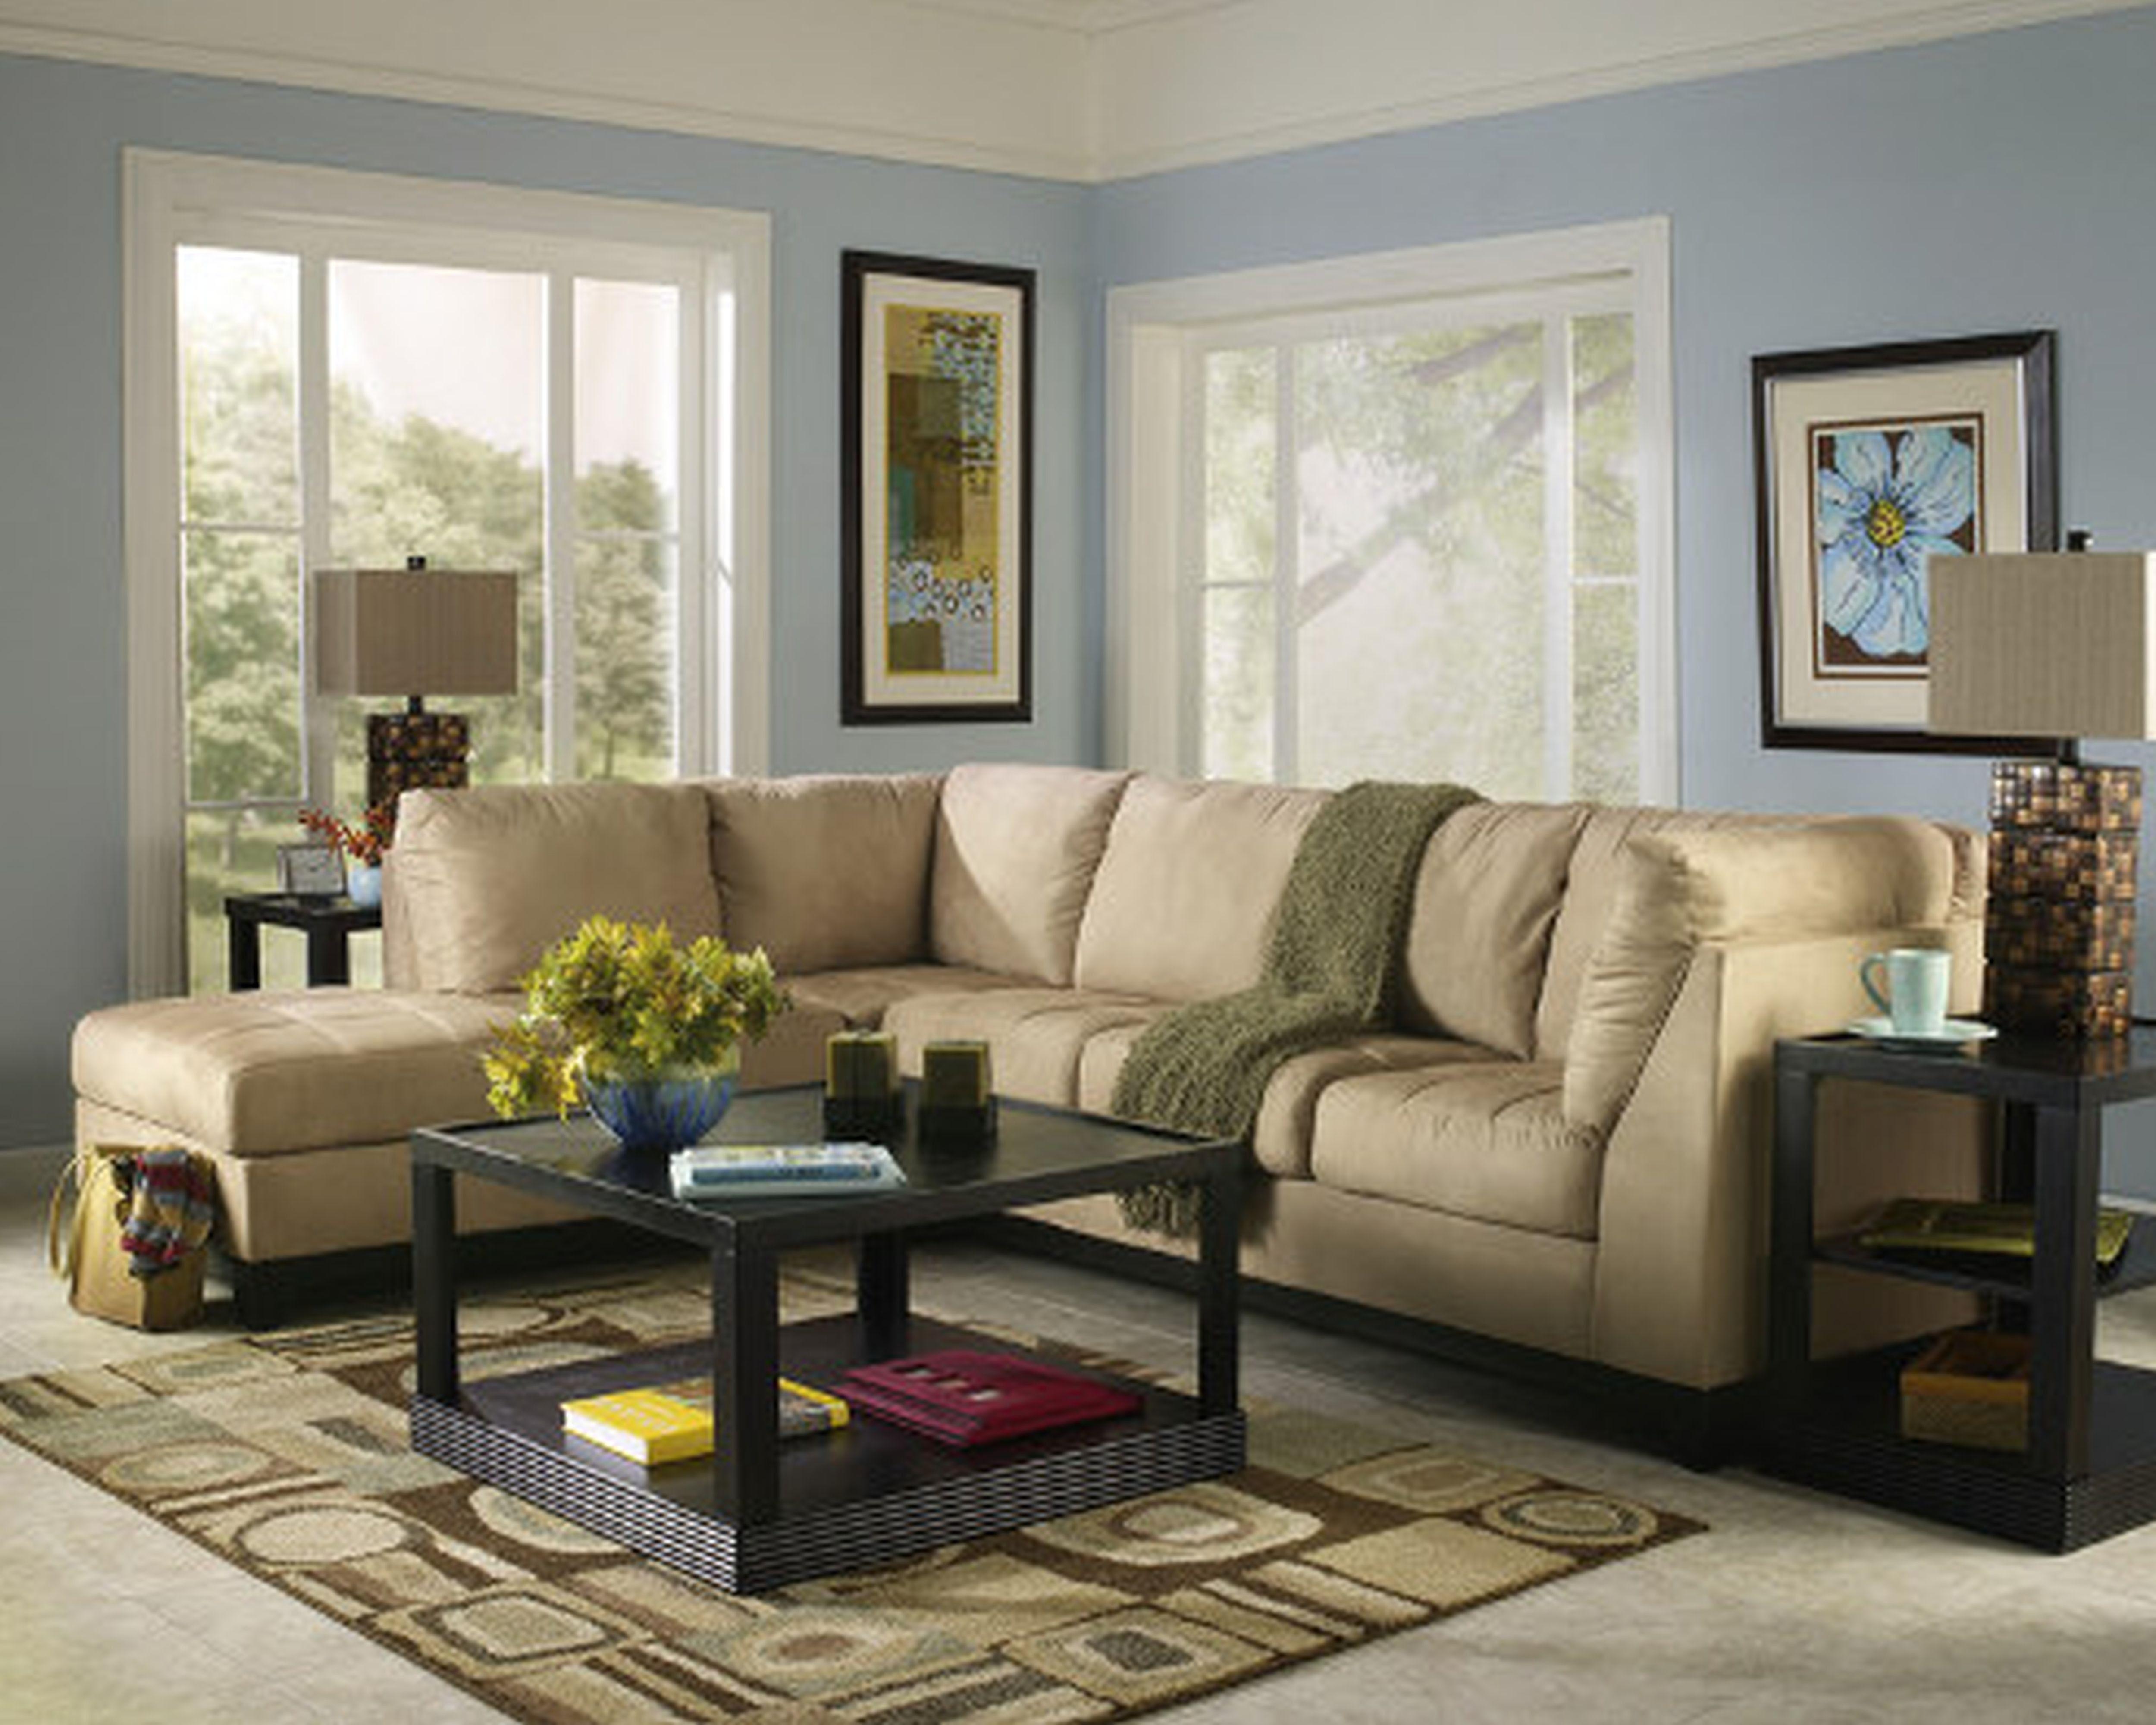 Pretty photo of simple elegant living room decor designs - Simple elegant living room design ...